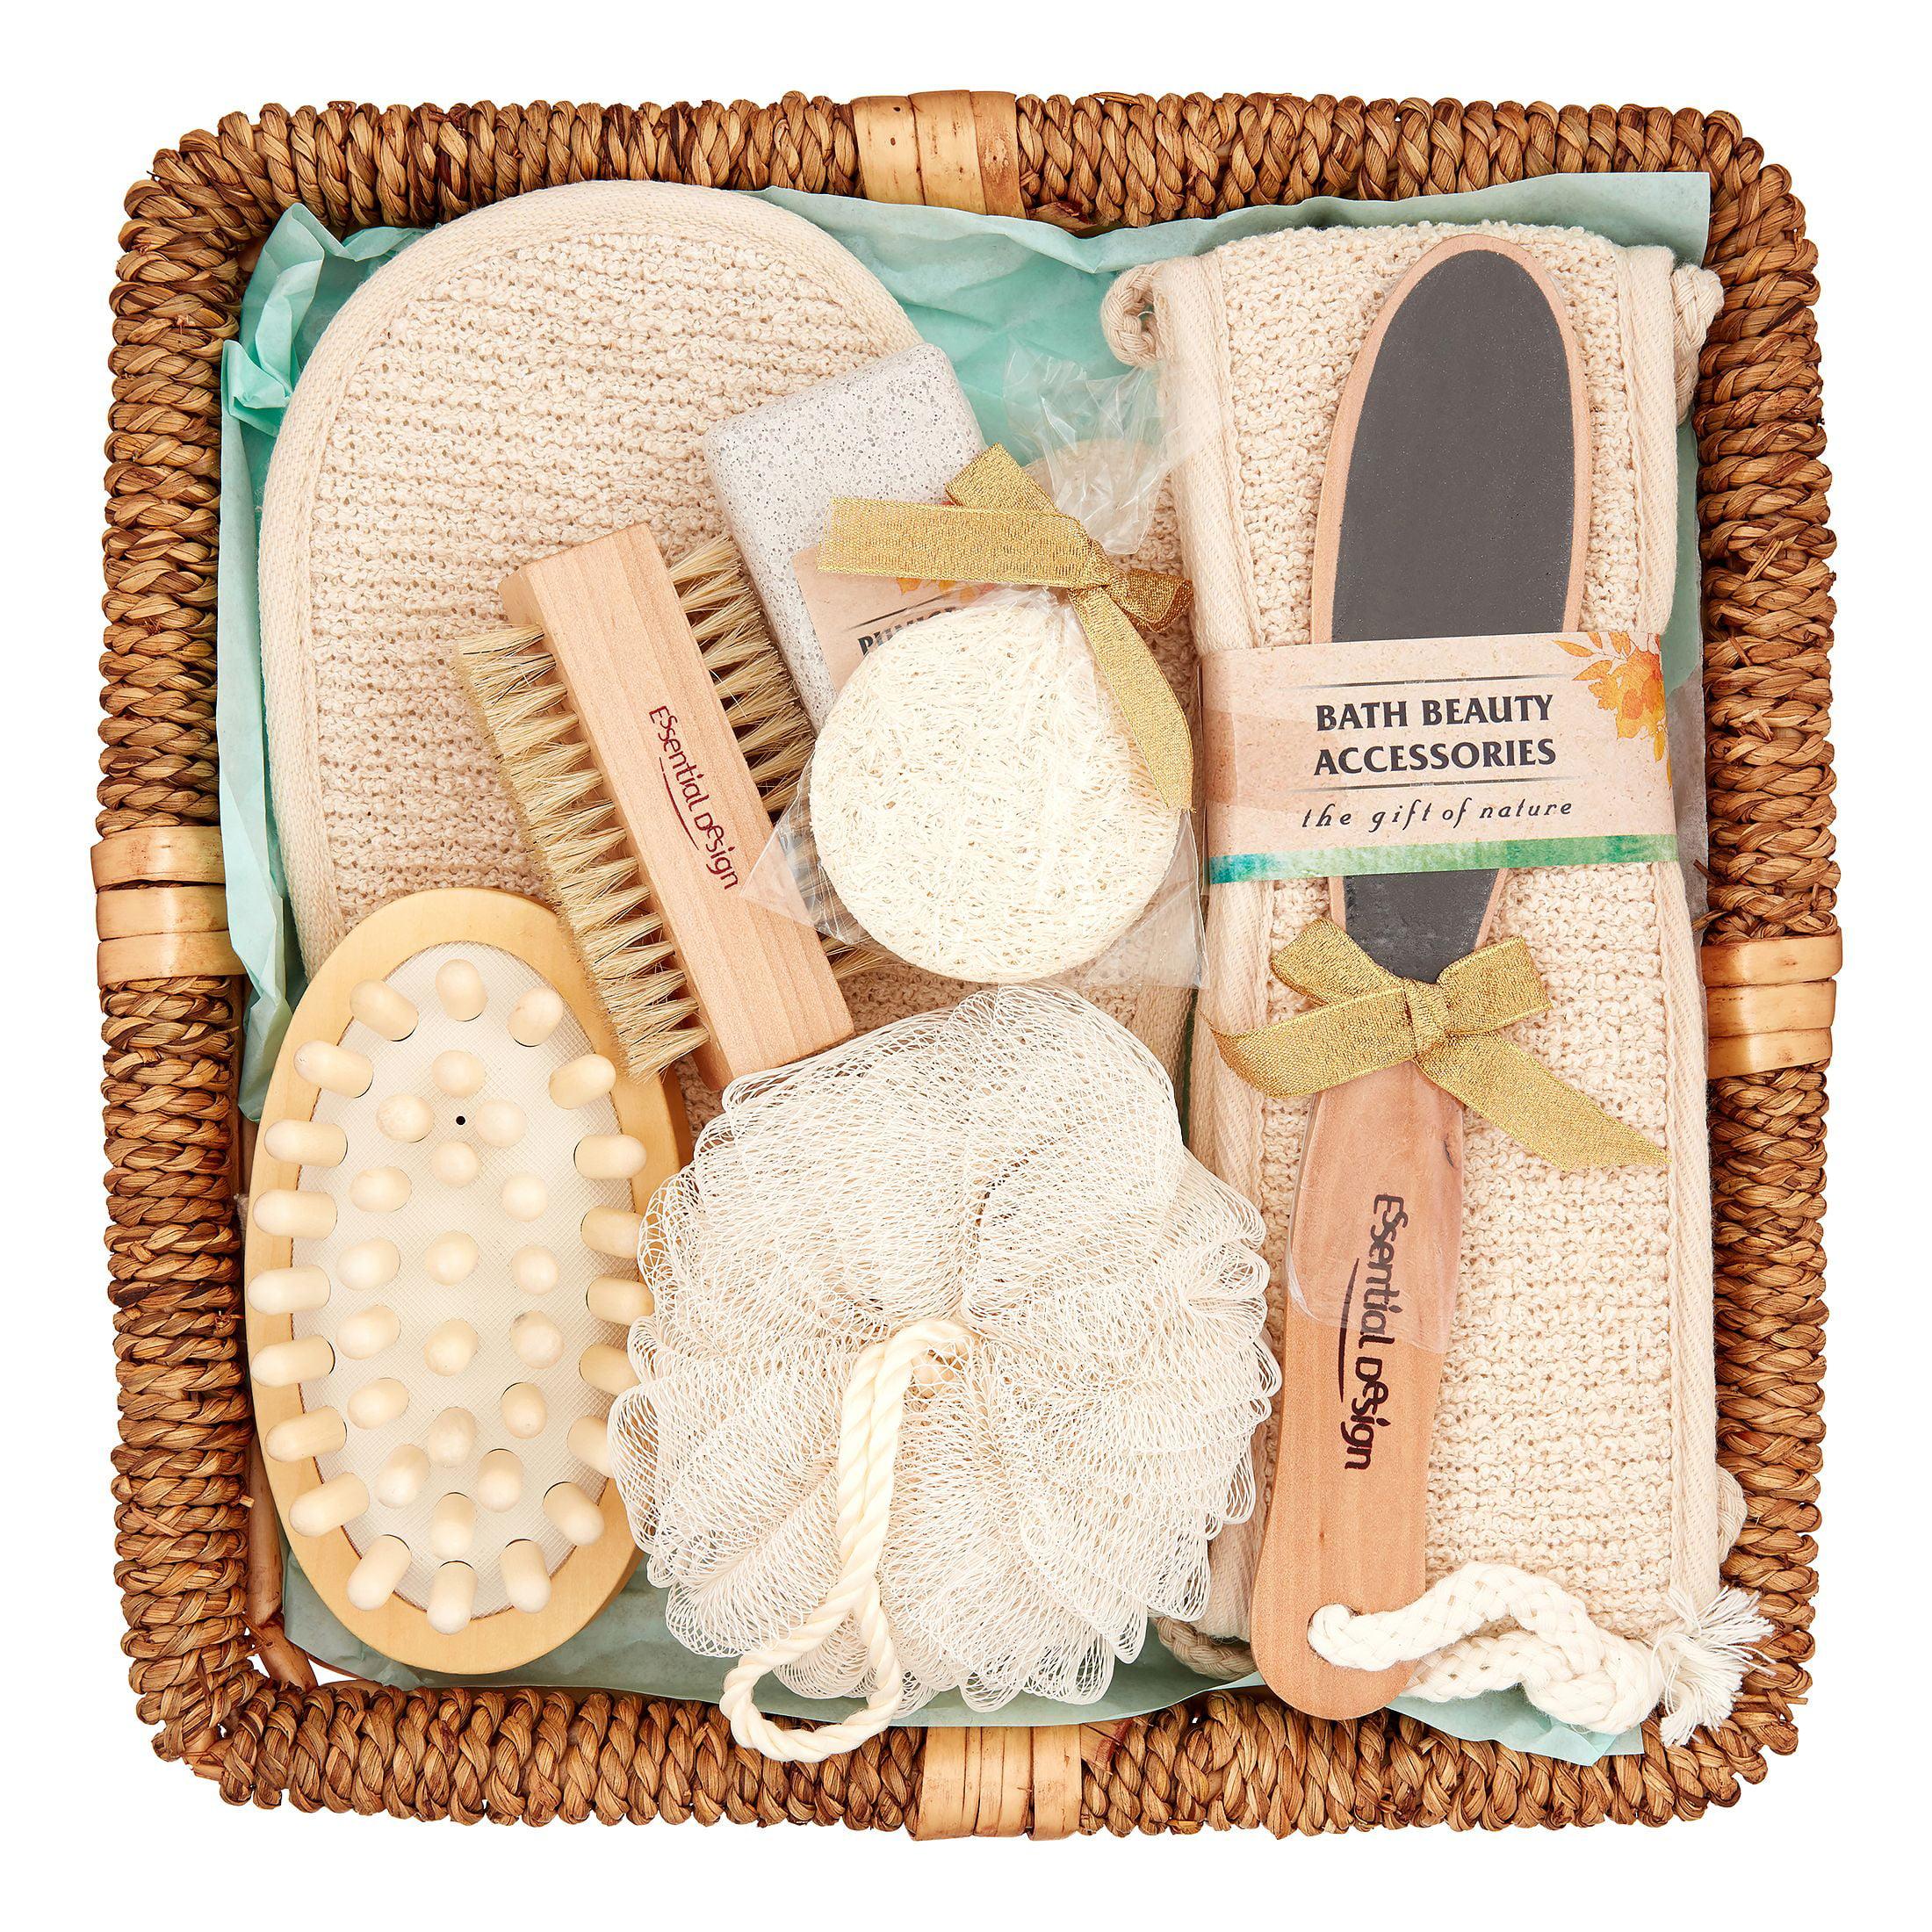 Essential Design Bath Spa Gift Set In Rattan Basket 9 Pieces